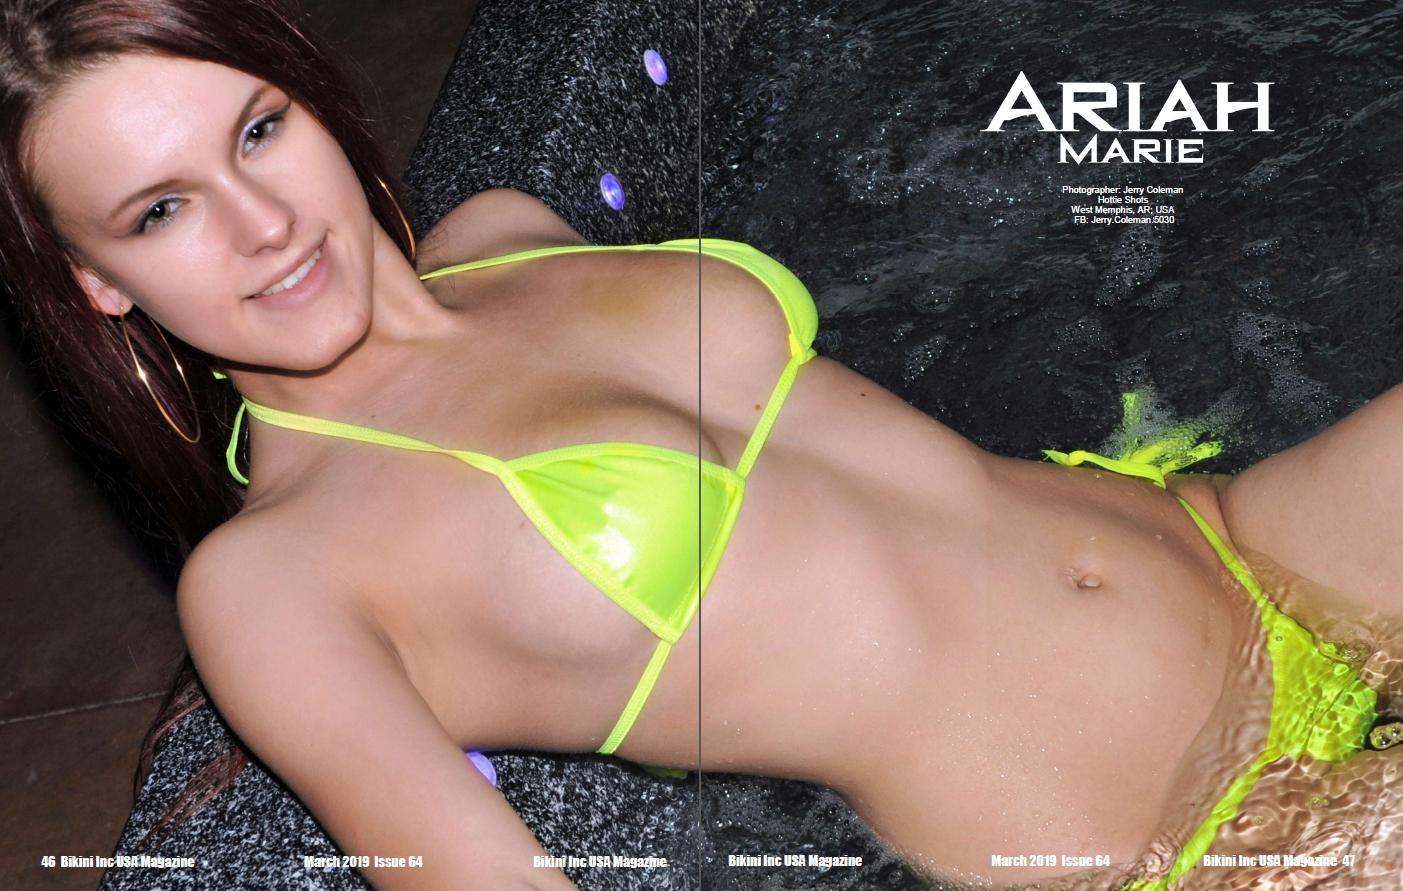 Ariah Marie - Mar 2019